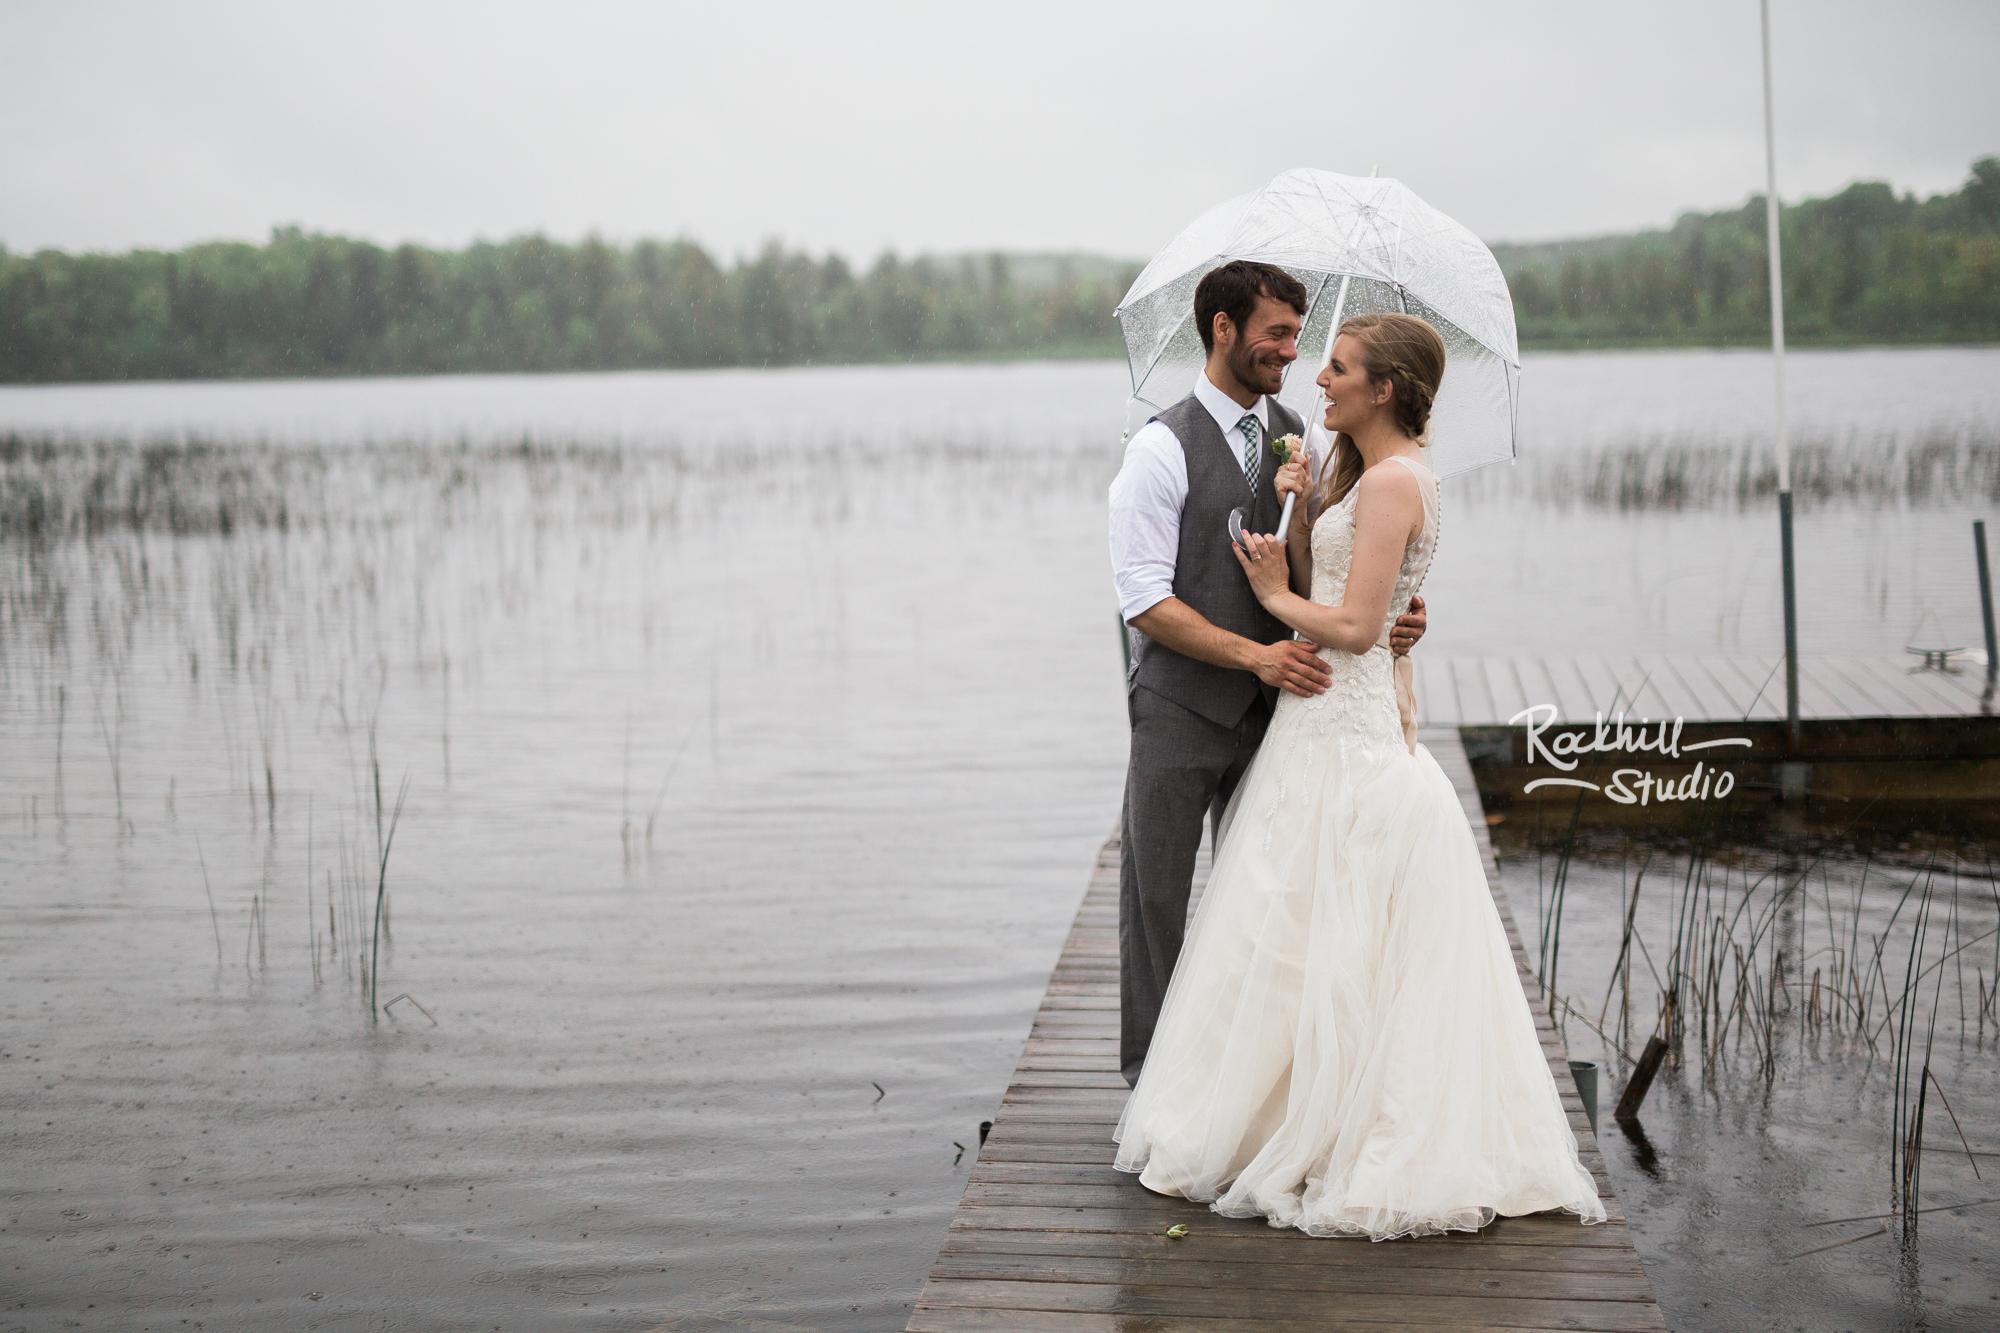 marquette-michigan-wedding-upper-peninsula-spring-photography-rockhill-ee-75.jpg